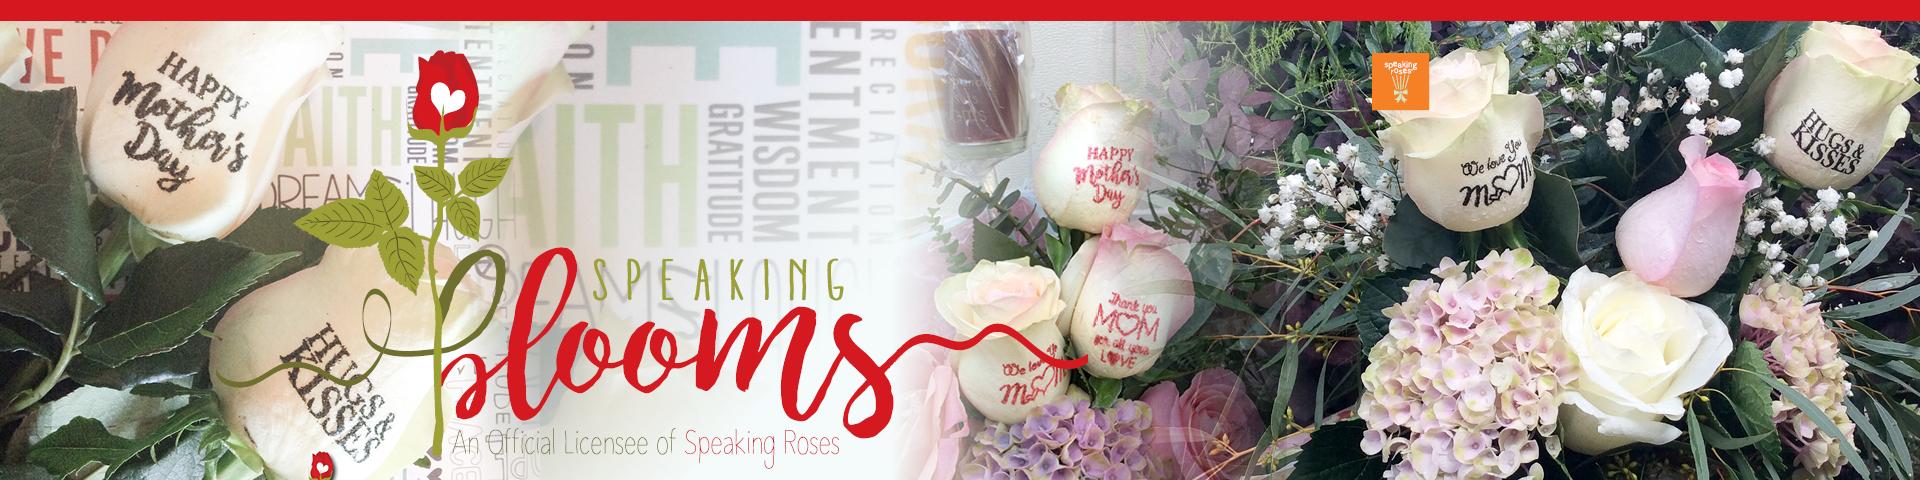 Speakingblooms.com An official representative of Speaking Roses International